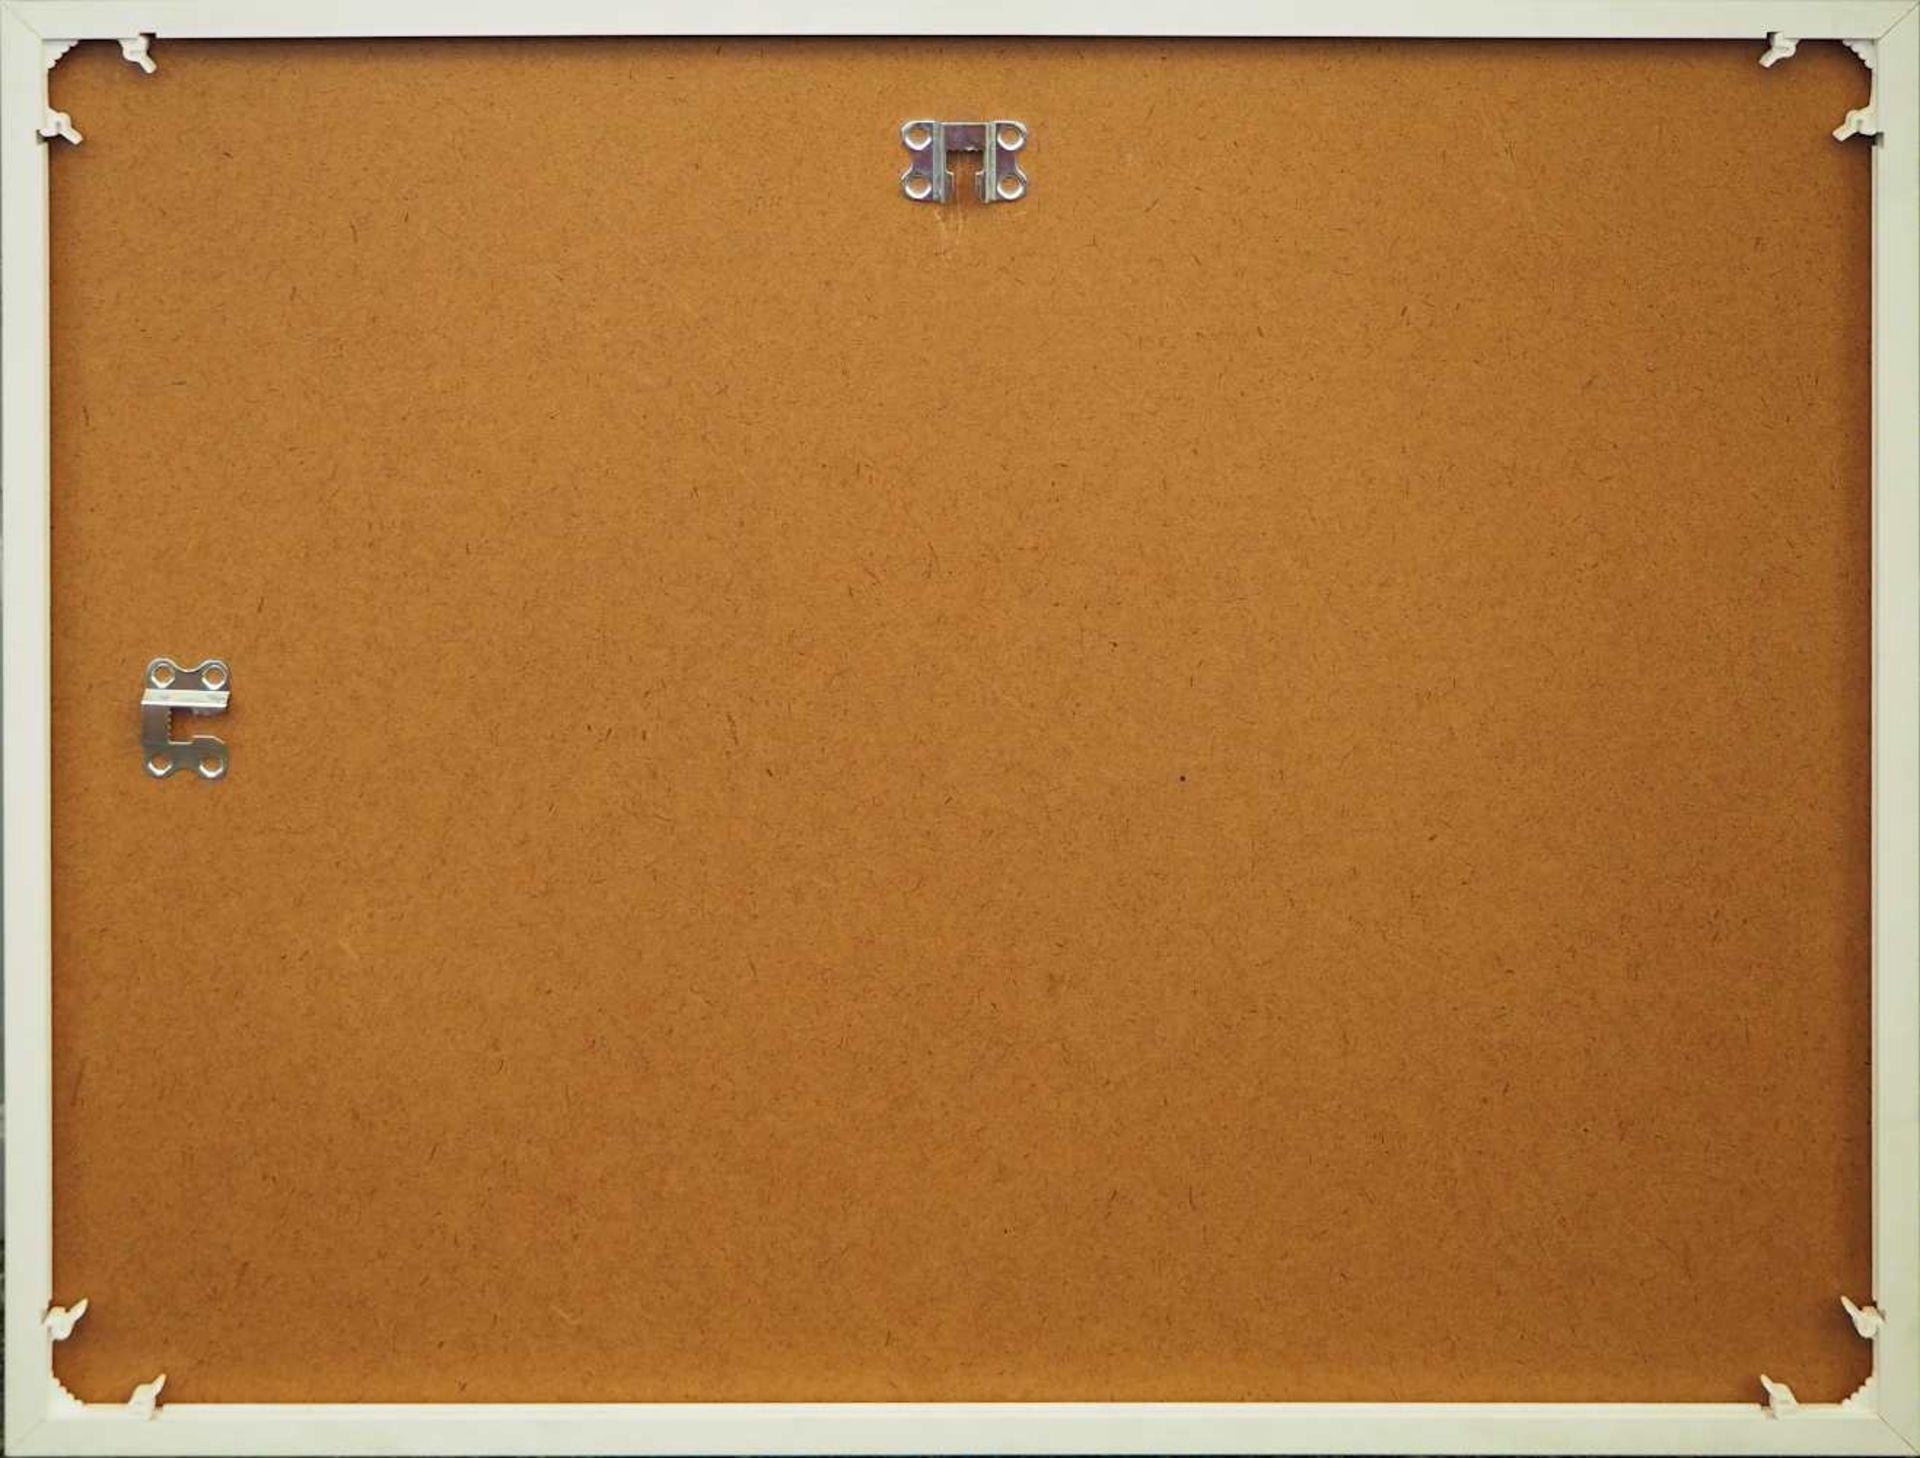 "1 Farblithografie R.u. bleistiftsign. M. M. PRECHTL (wohl Michael Mathias P. 1926-2003), ""Rembra - Bild 6 aus 6"